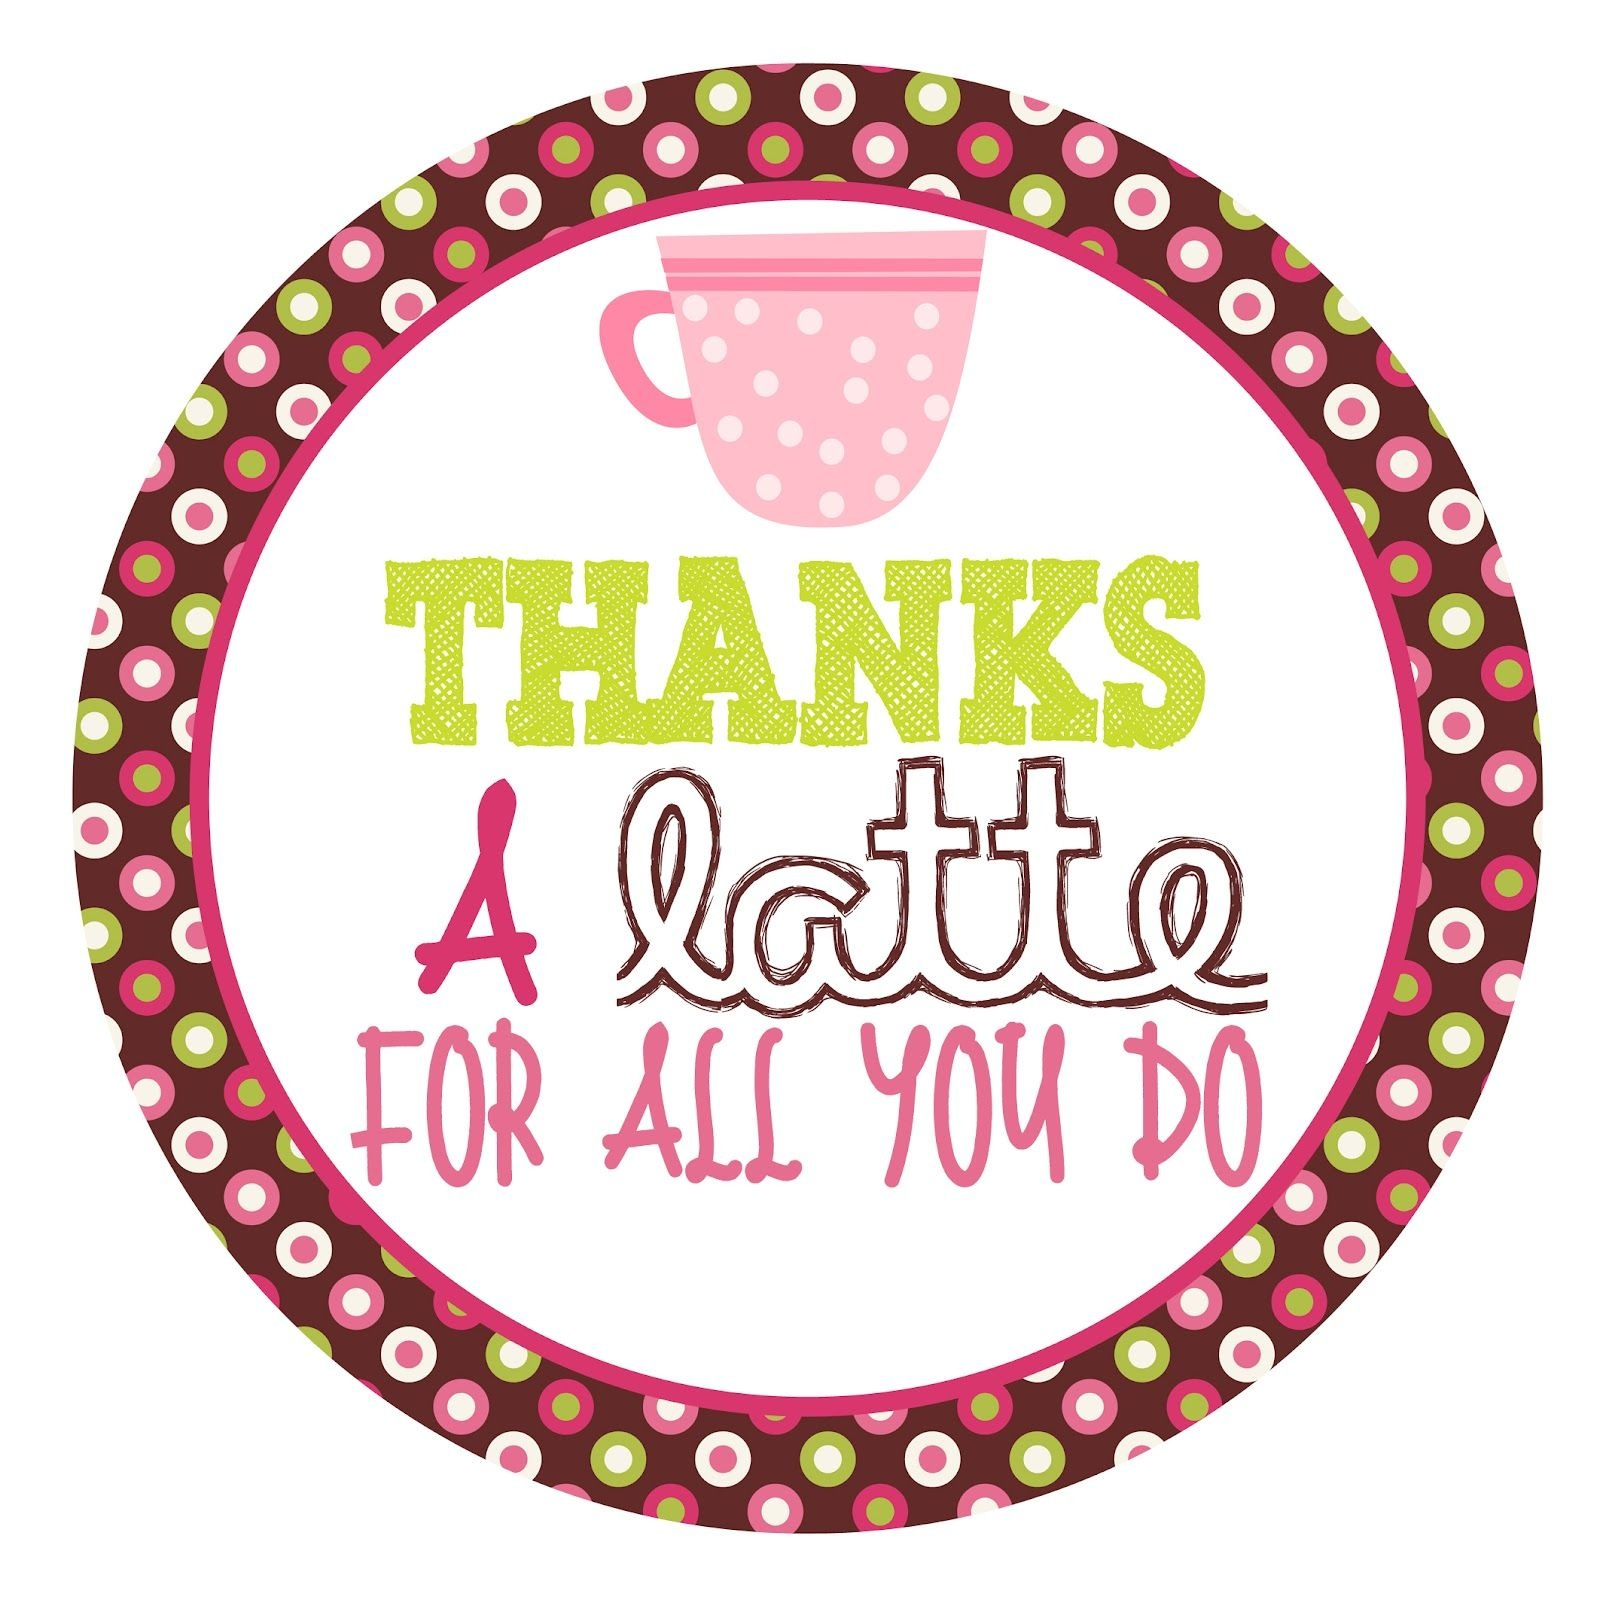 Free Printable Tag For Coffee Gift Card | Diy | Gift Ideas | Teacher - Thanks A Latte Free Printable Tag